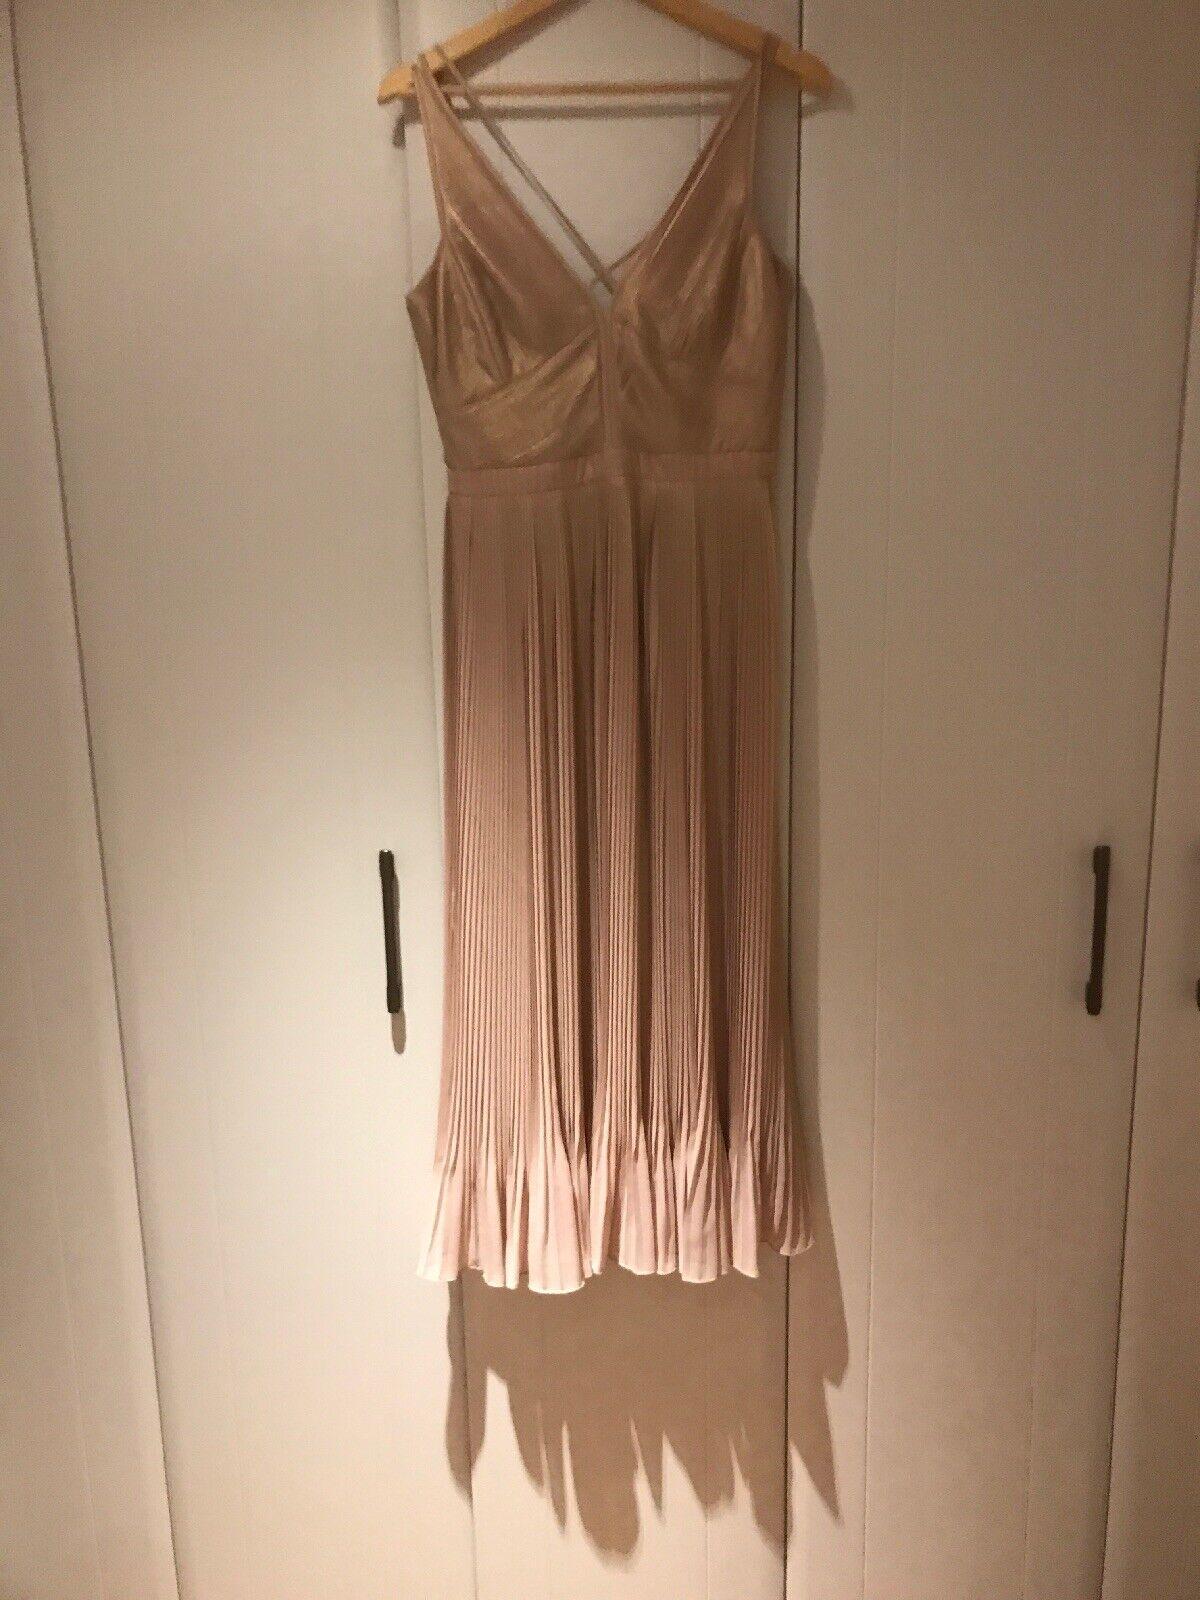 Karen Millen pink gold Shimmer Dress Size 10 Bnwot Bnwot Bnwot de0c2e